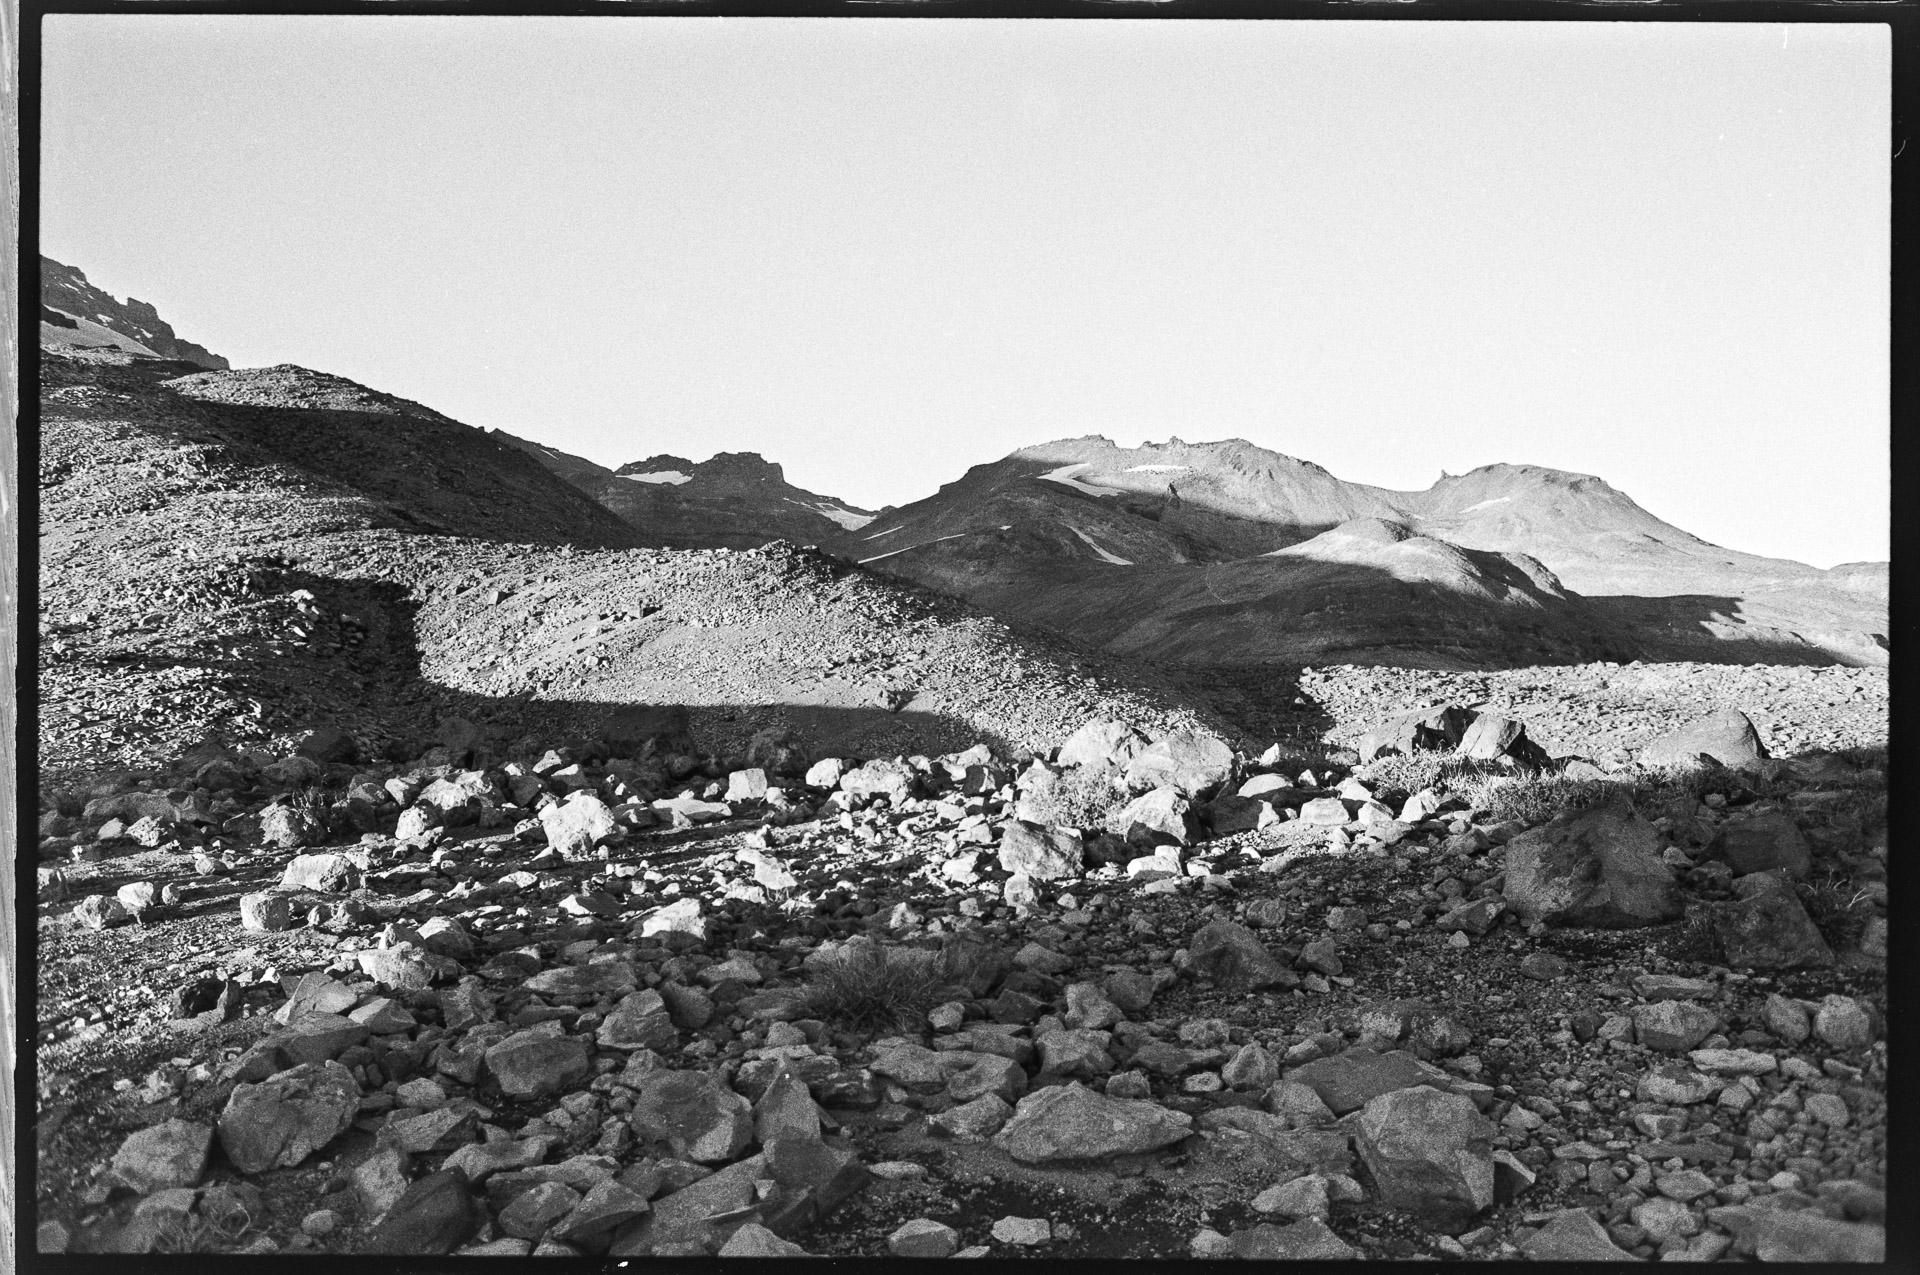 Walk Mt Ranier—Chris-Page-Art-8.jpg